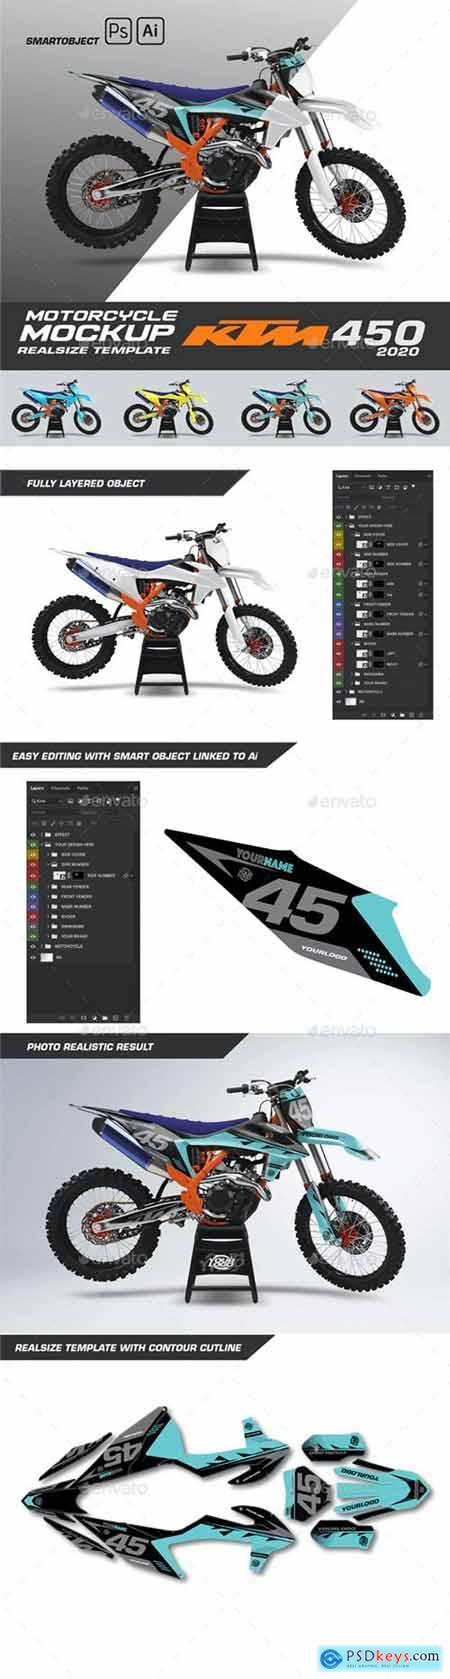 KTM 450 Mockup - 29401075